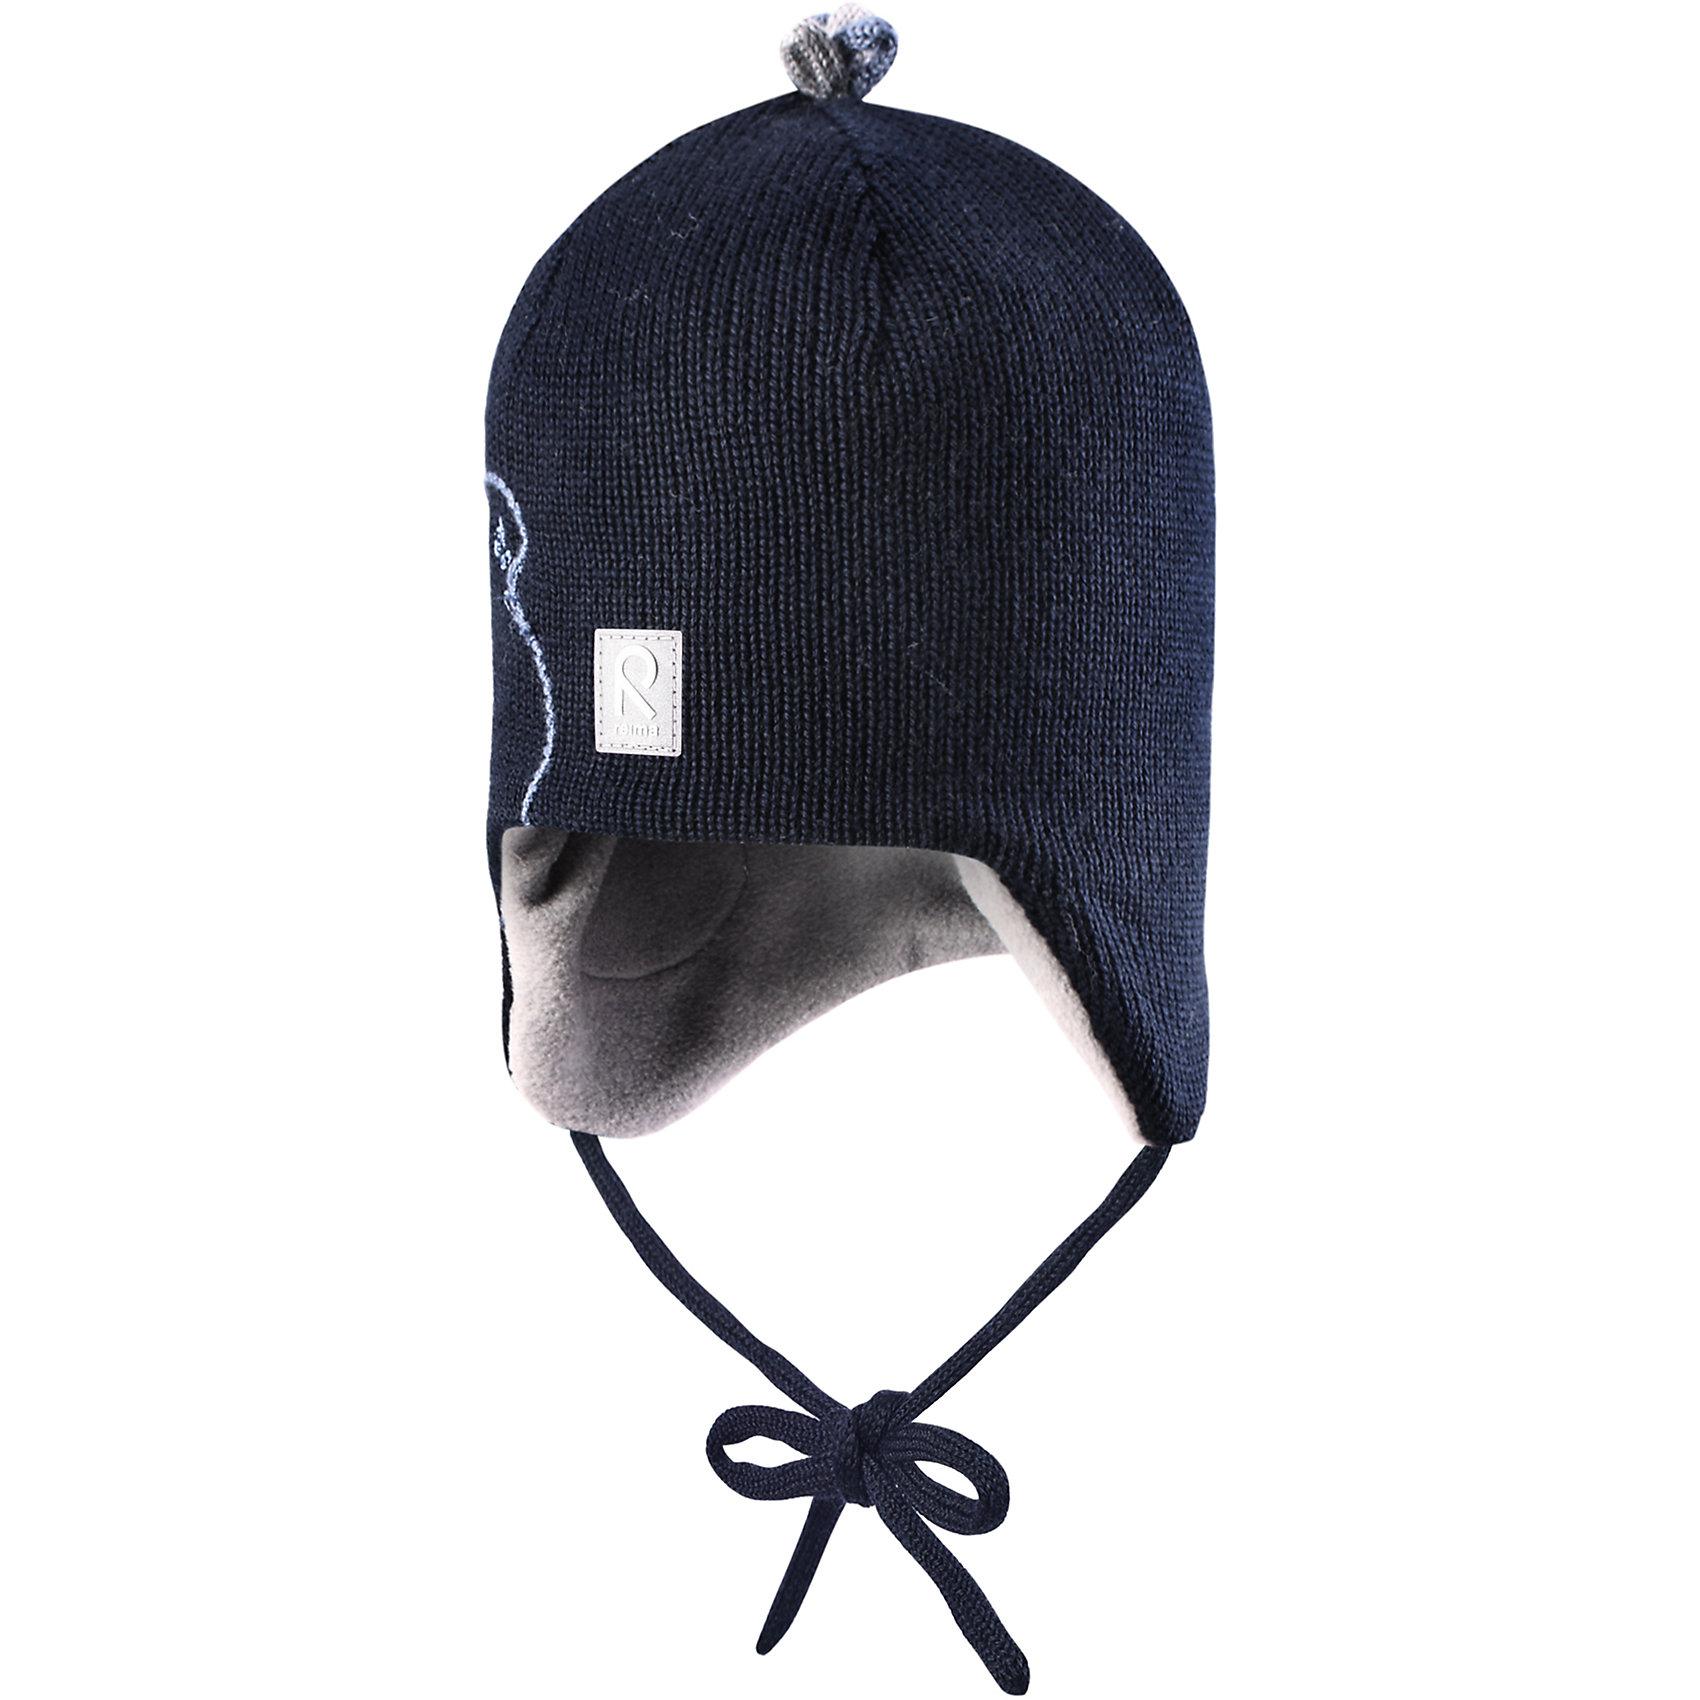 Reima Шапка Kinostus для мальчика Reima reima шапка samooja для мальчика reima